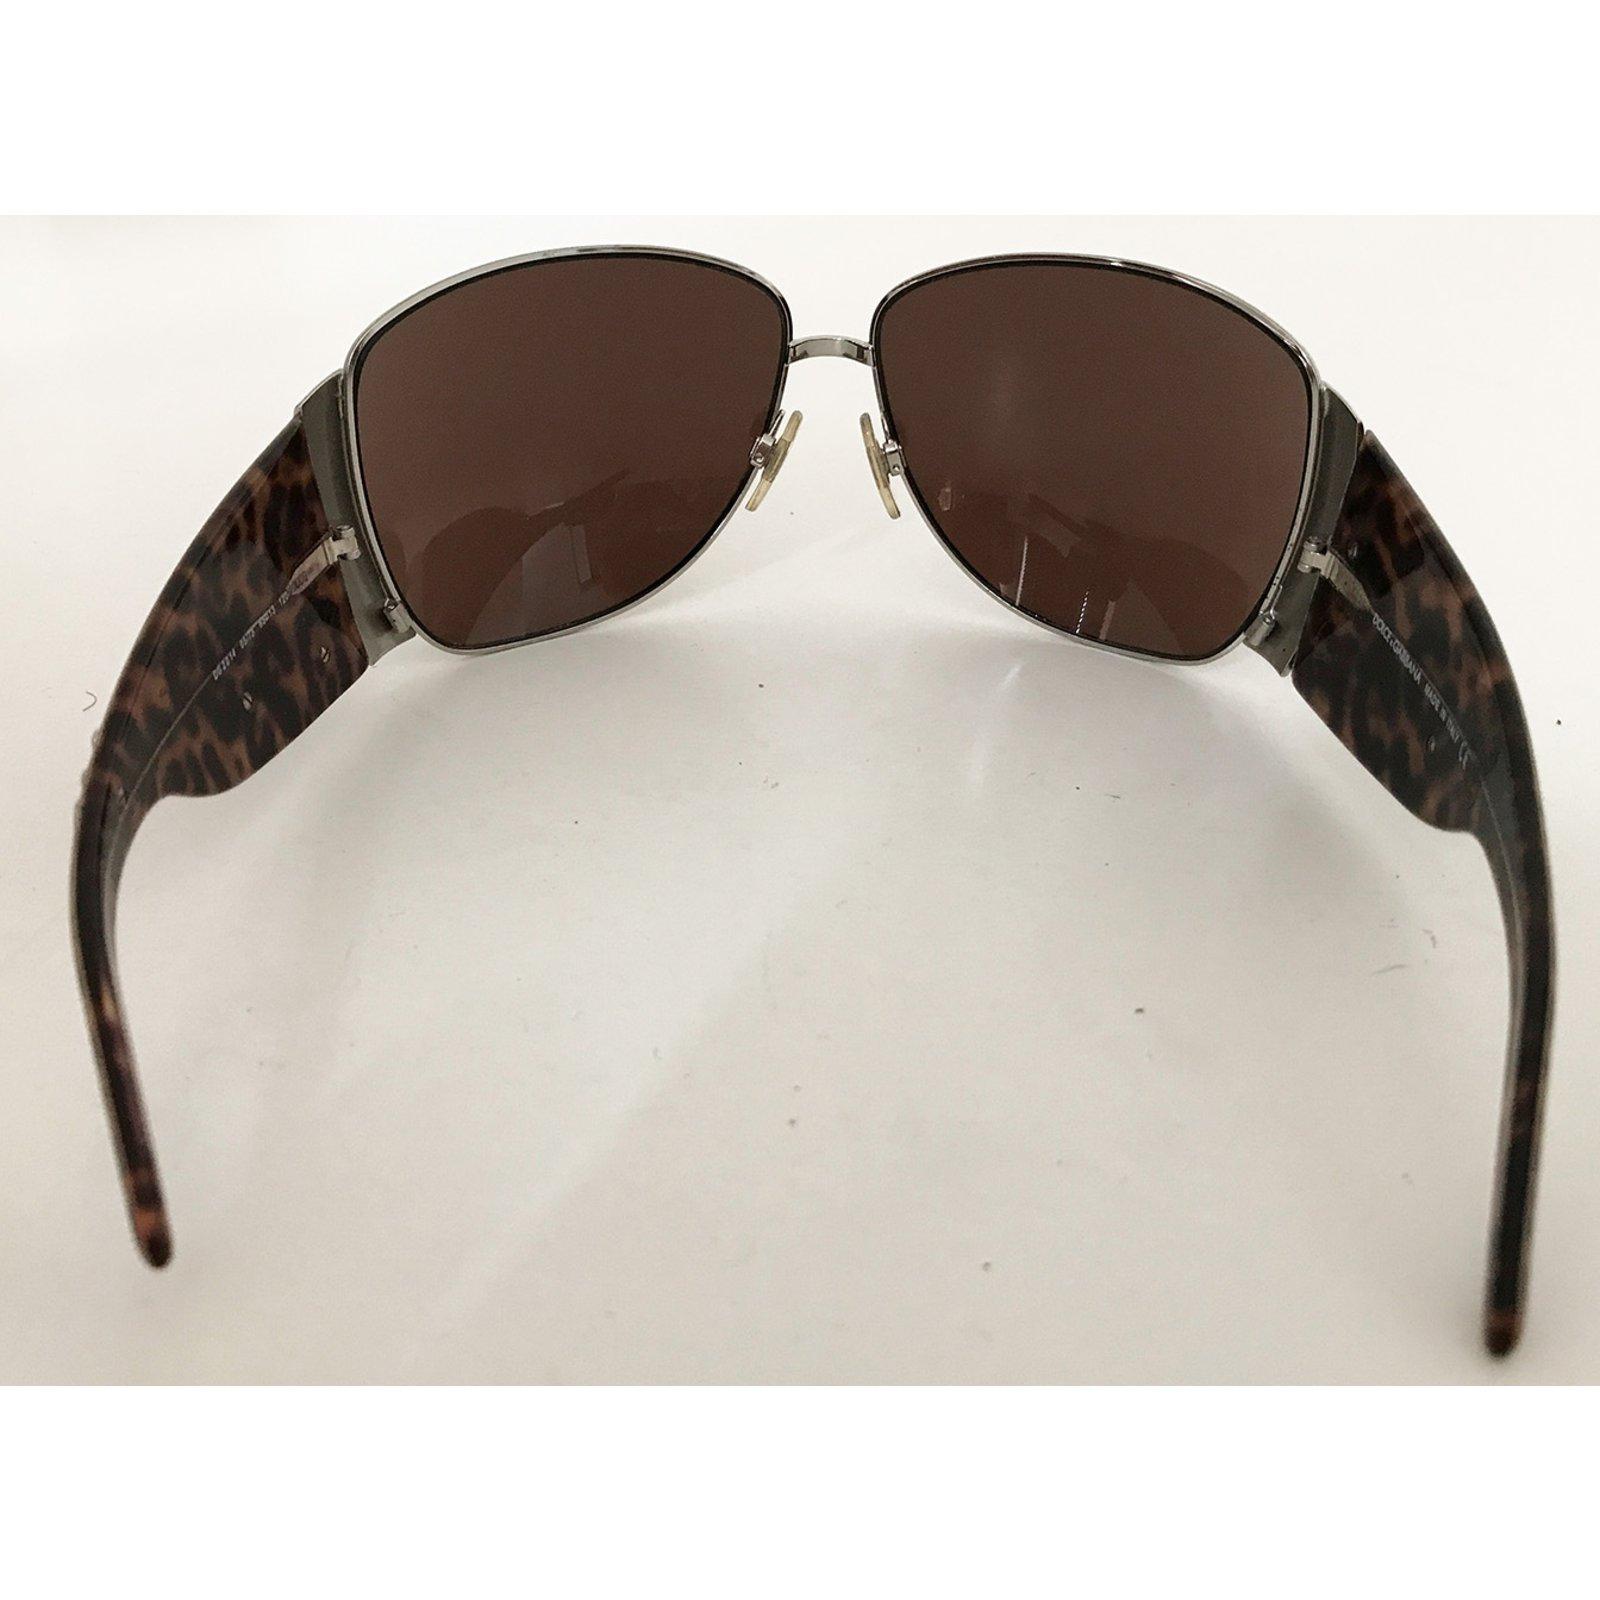 ca45467b0c5a Dolce & Gabbana Sunglasses Sunglasses Plastic Multiple colors ref.39910 -  Joli Closet